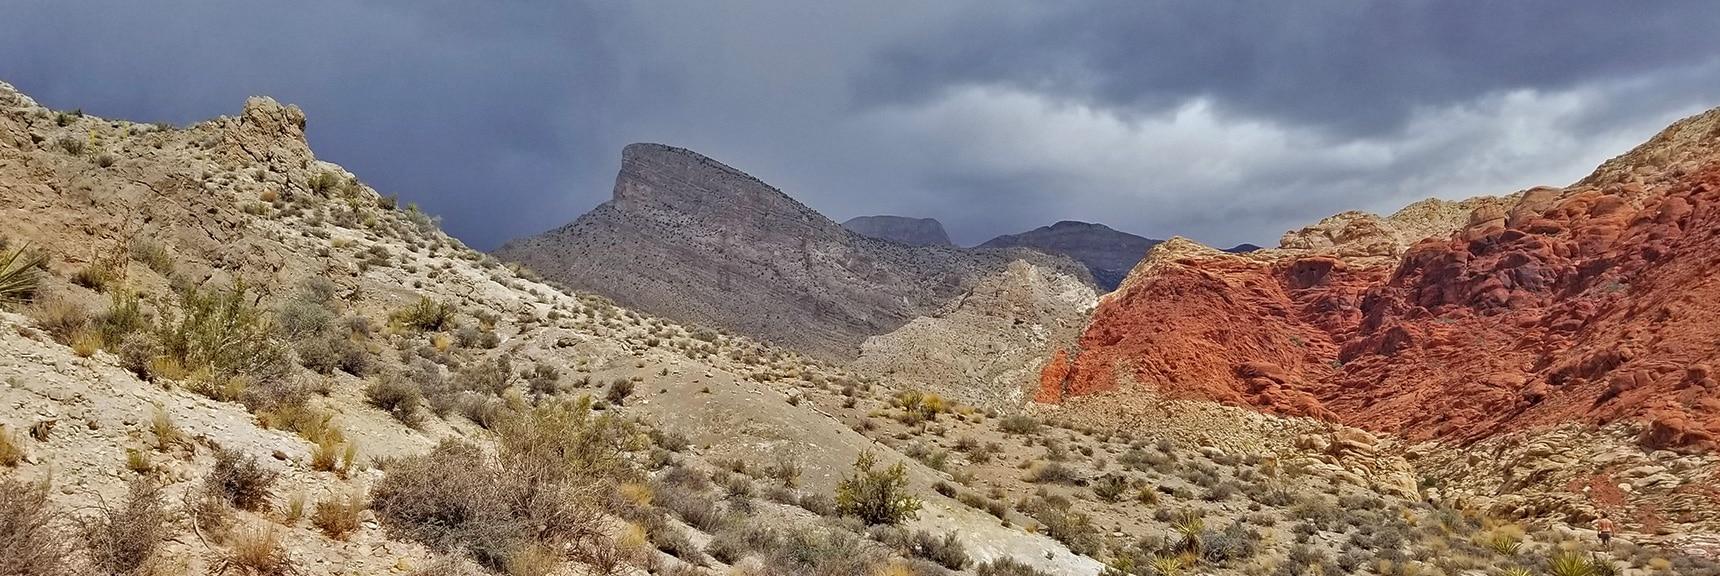 Turtlehead Peak from Pink Goblin Pass | Kraft Mountain Loop | Calico Basin, Nevada